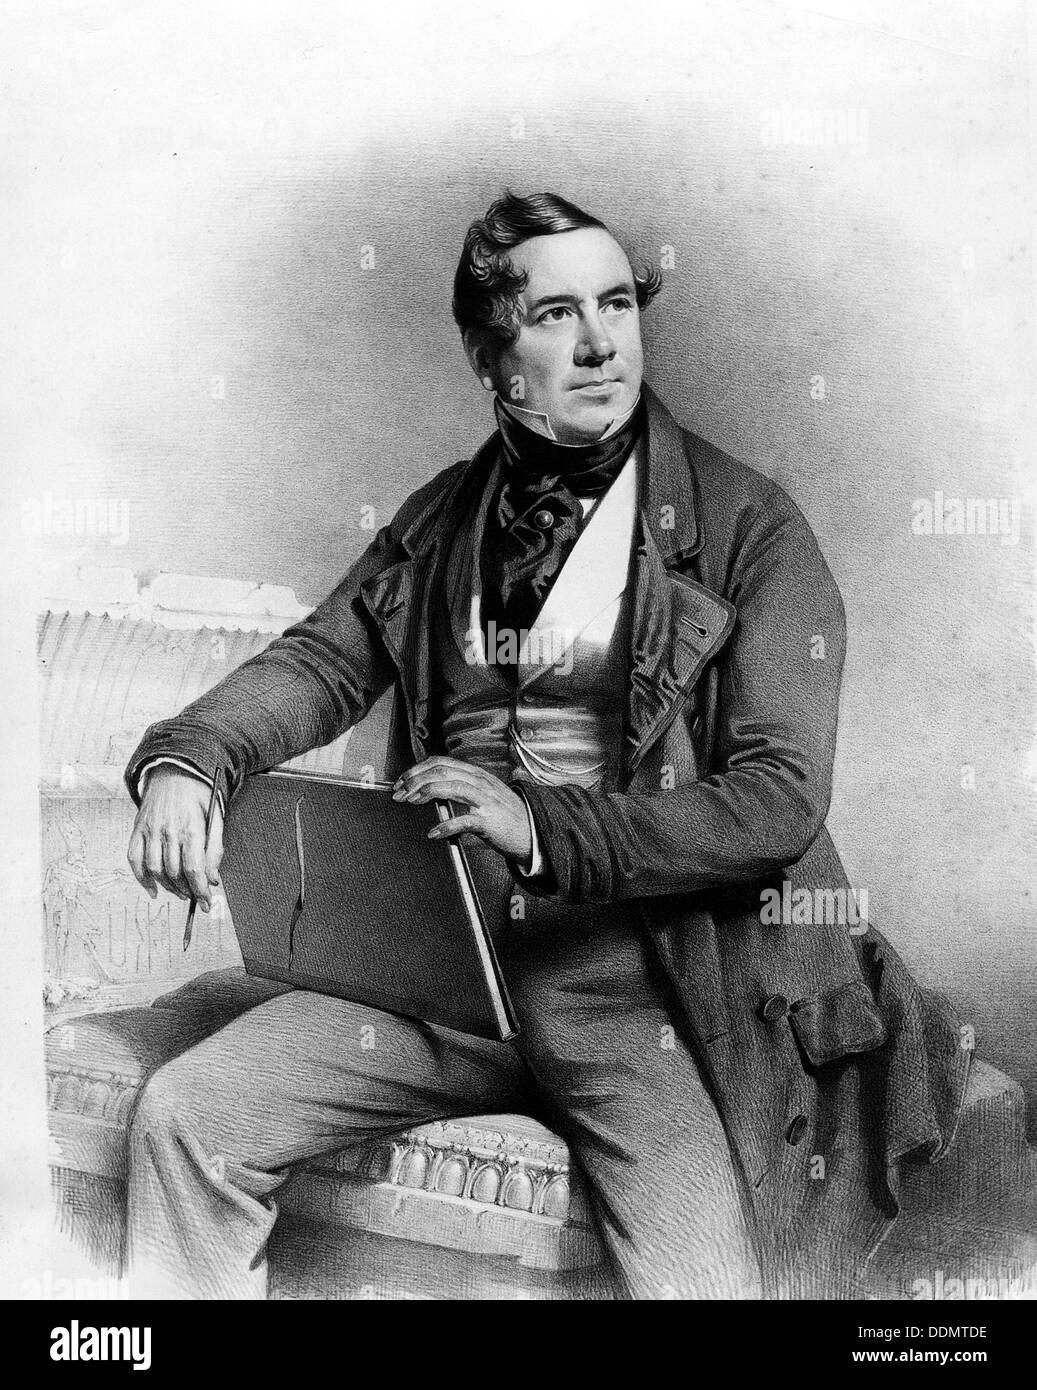 David Roberts (1796-1864), British artist, self-portrait. - Stock Image